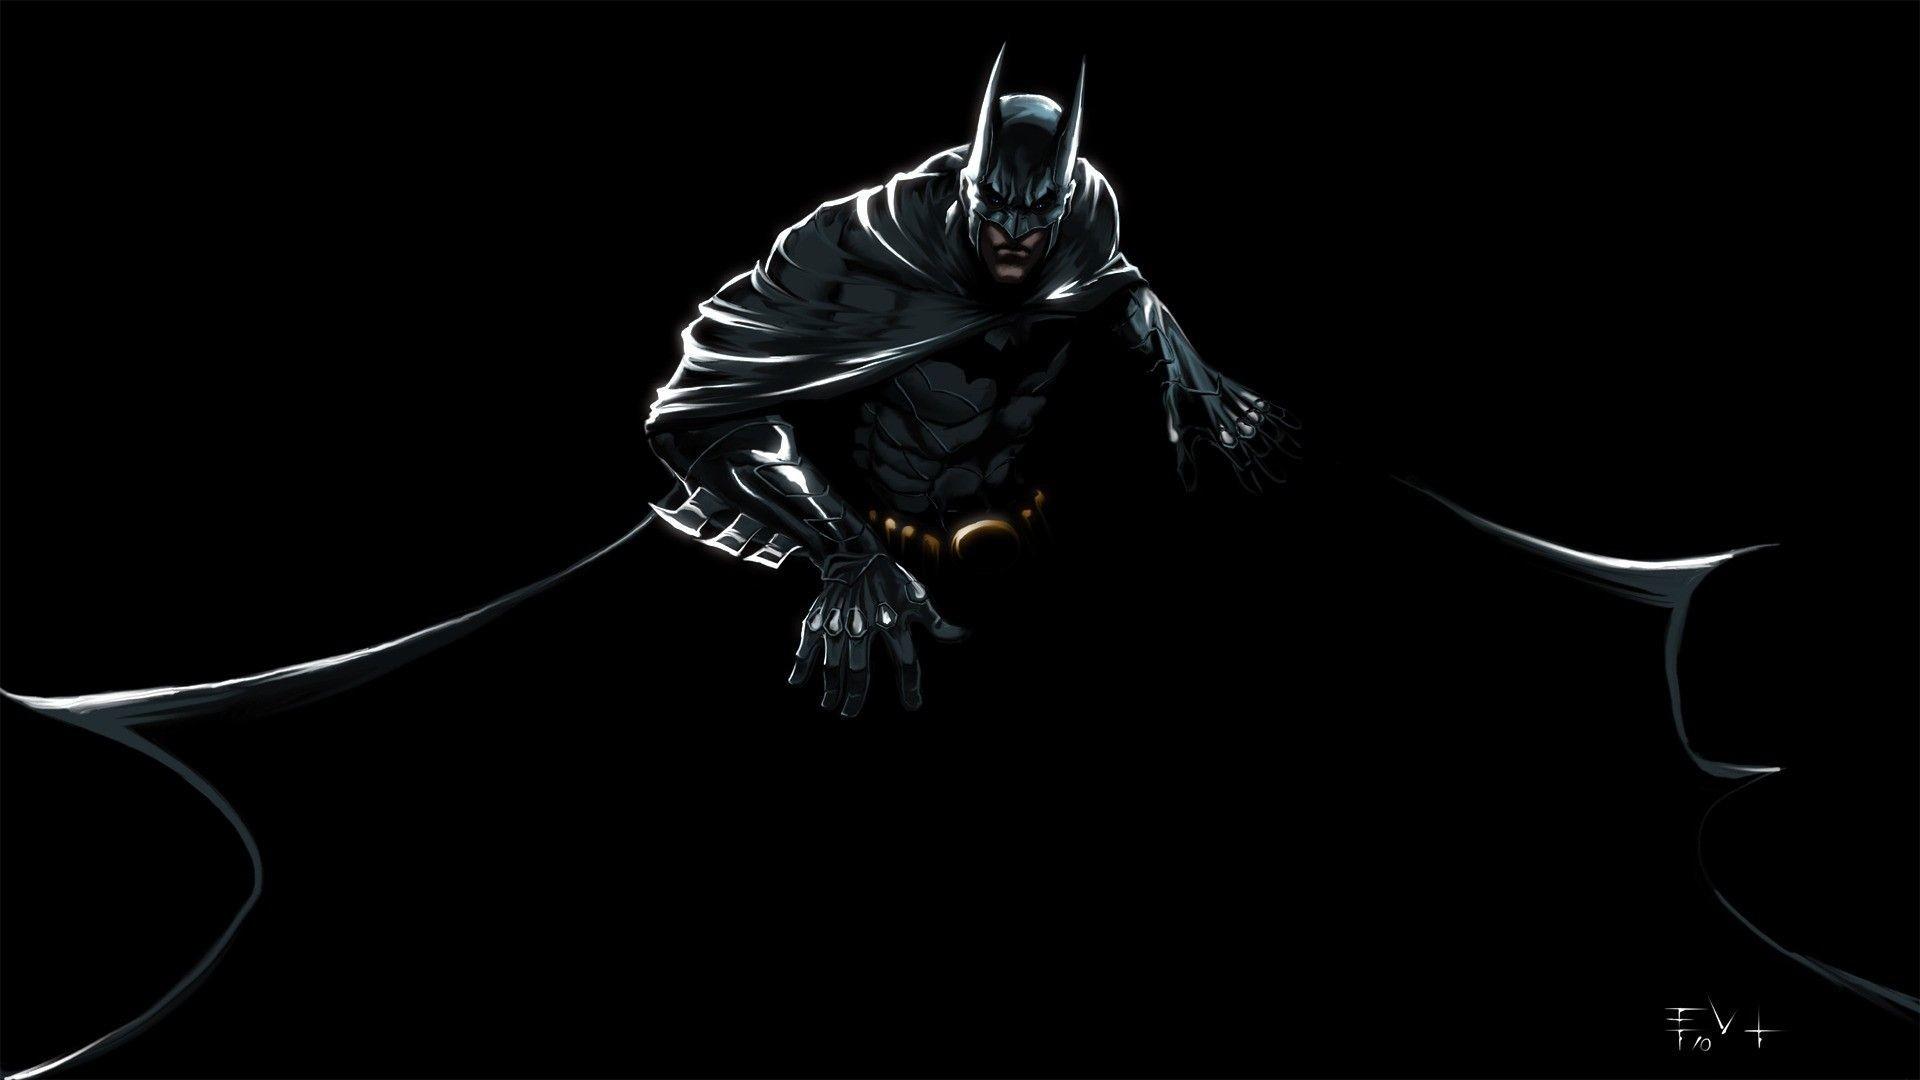 batman comics wallpapers for android